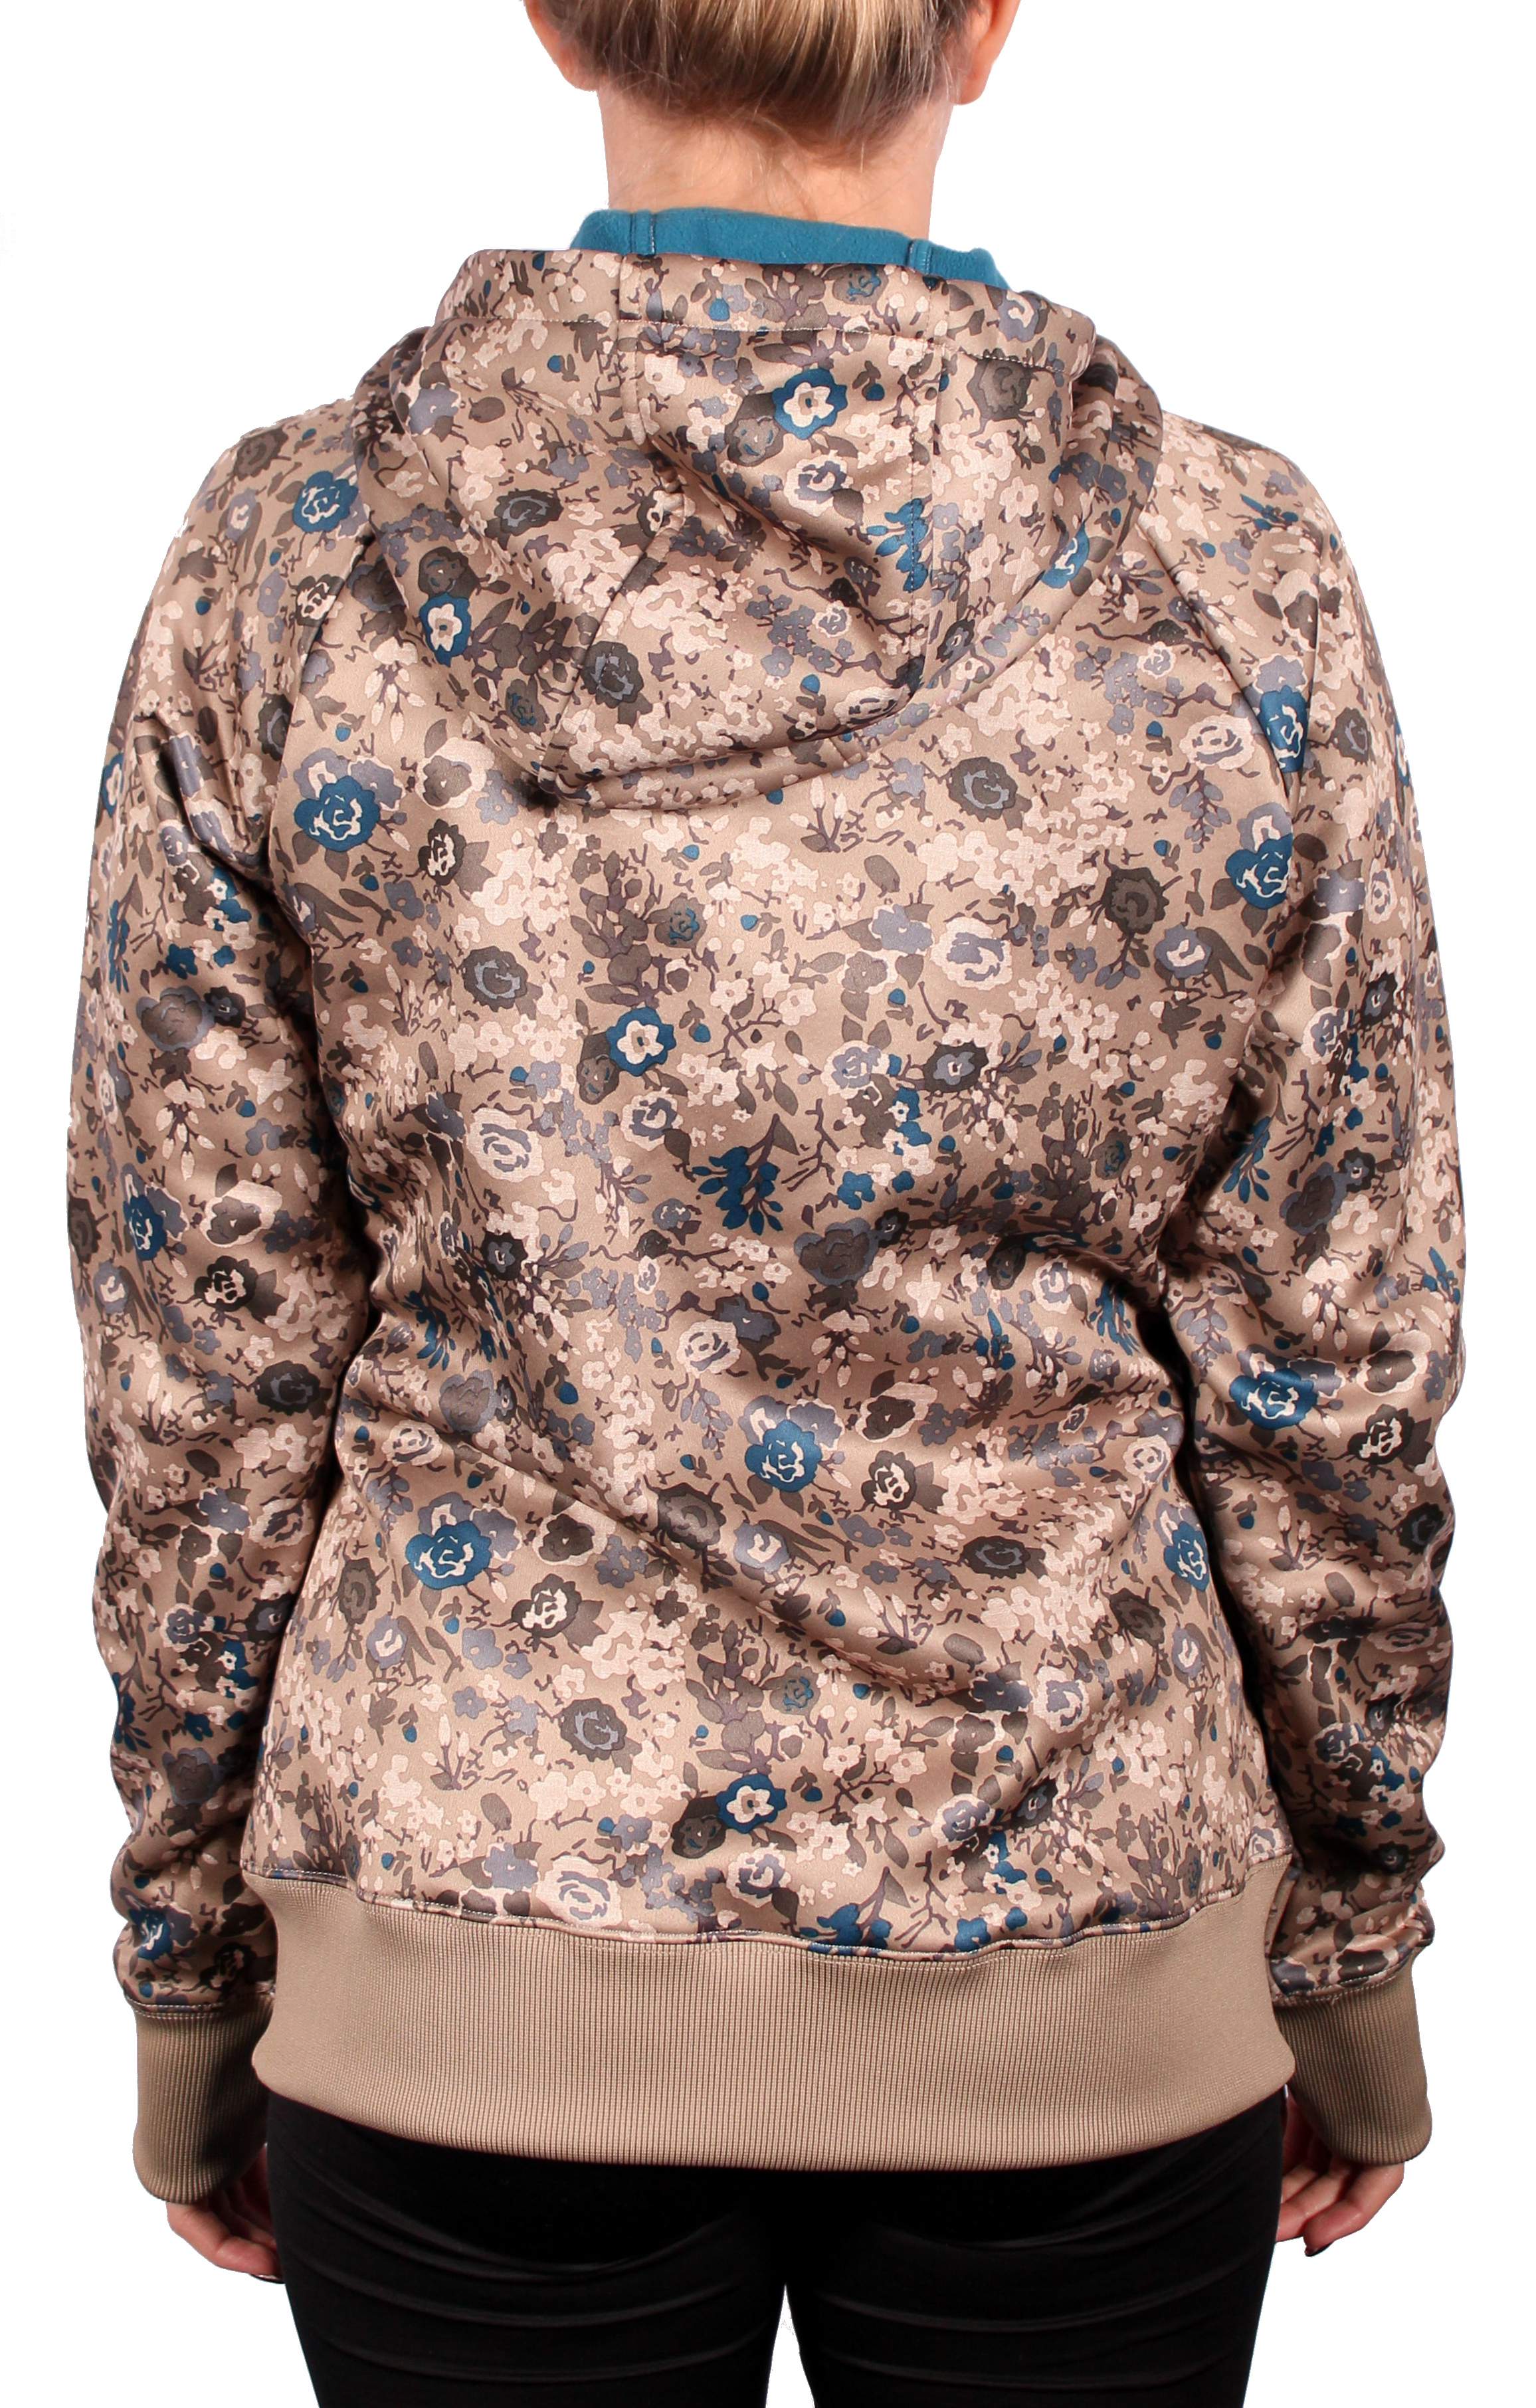 Bluza Burton Wms Scoop Hdd (Canvas Floral)